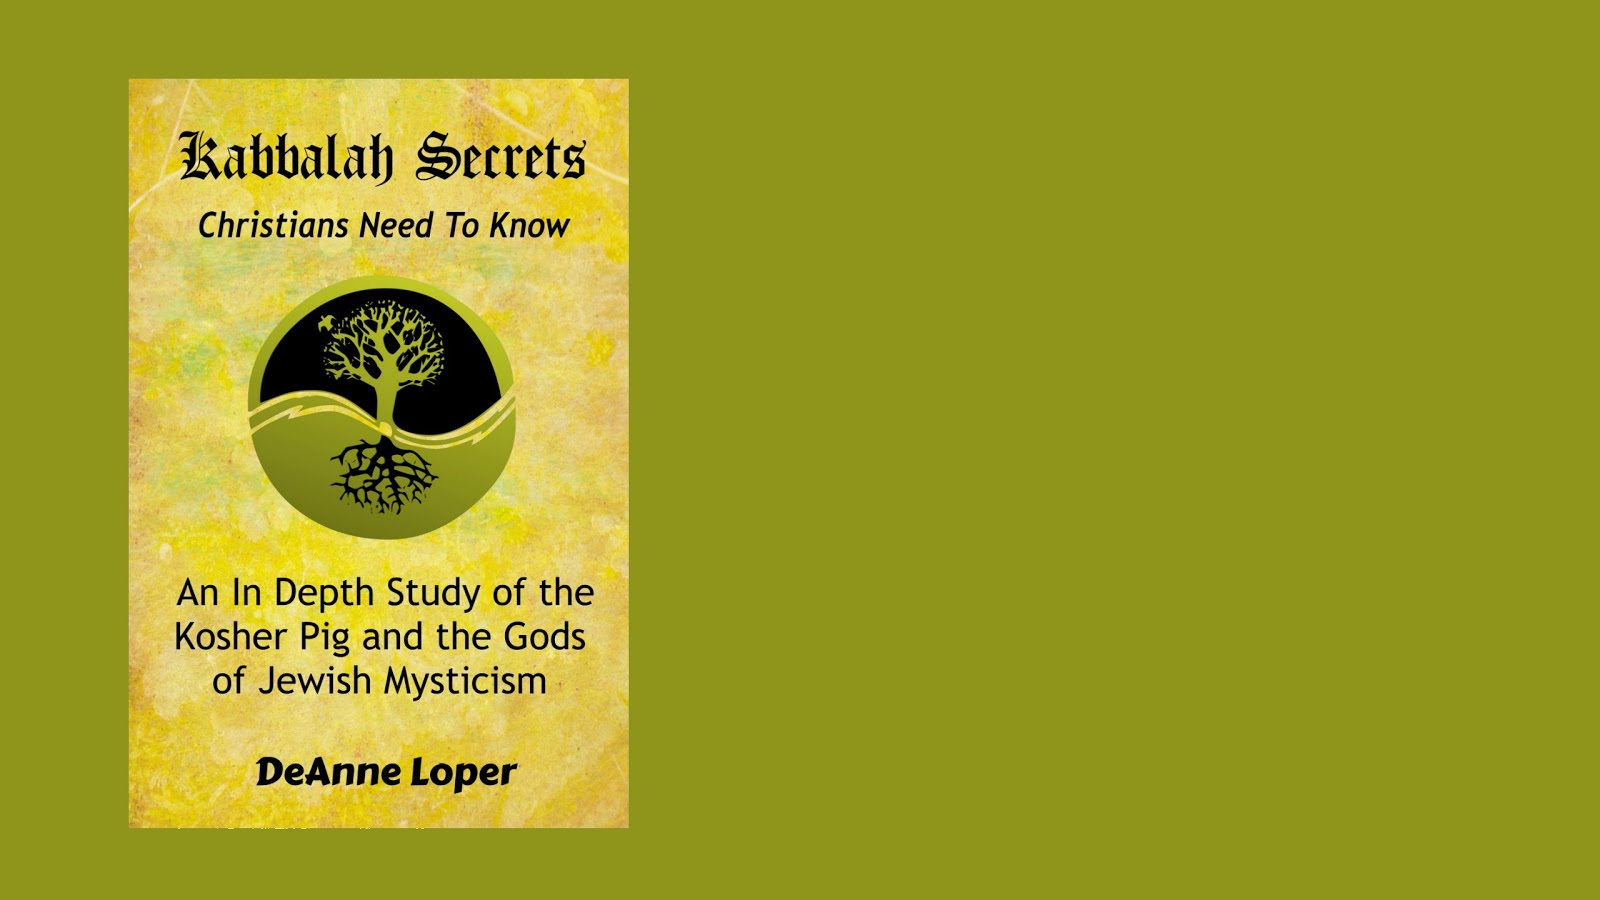 Kabbalah Secrets Christians Need to Know